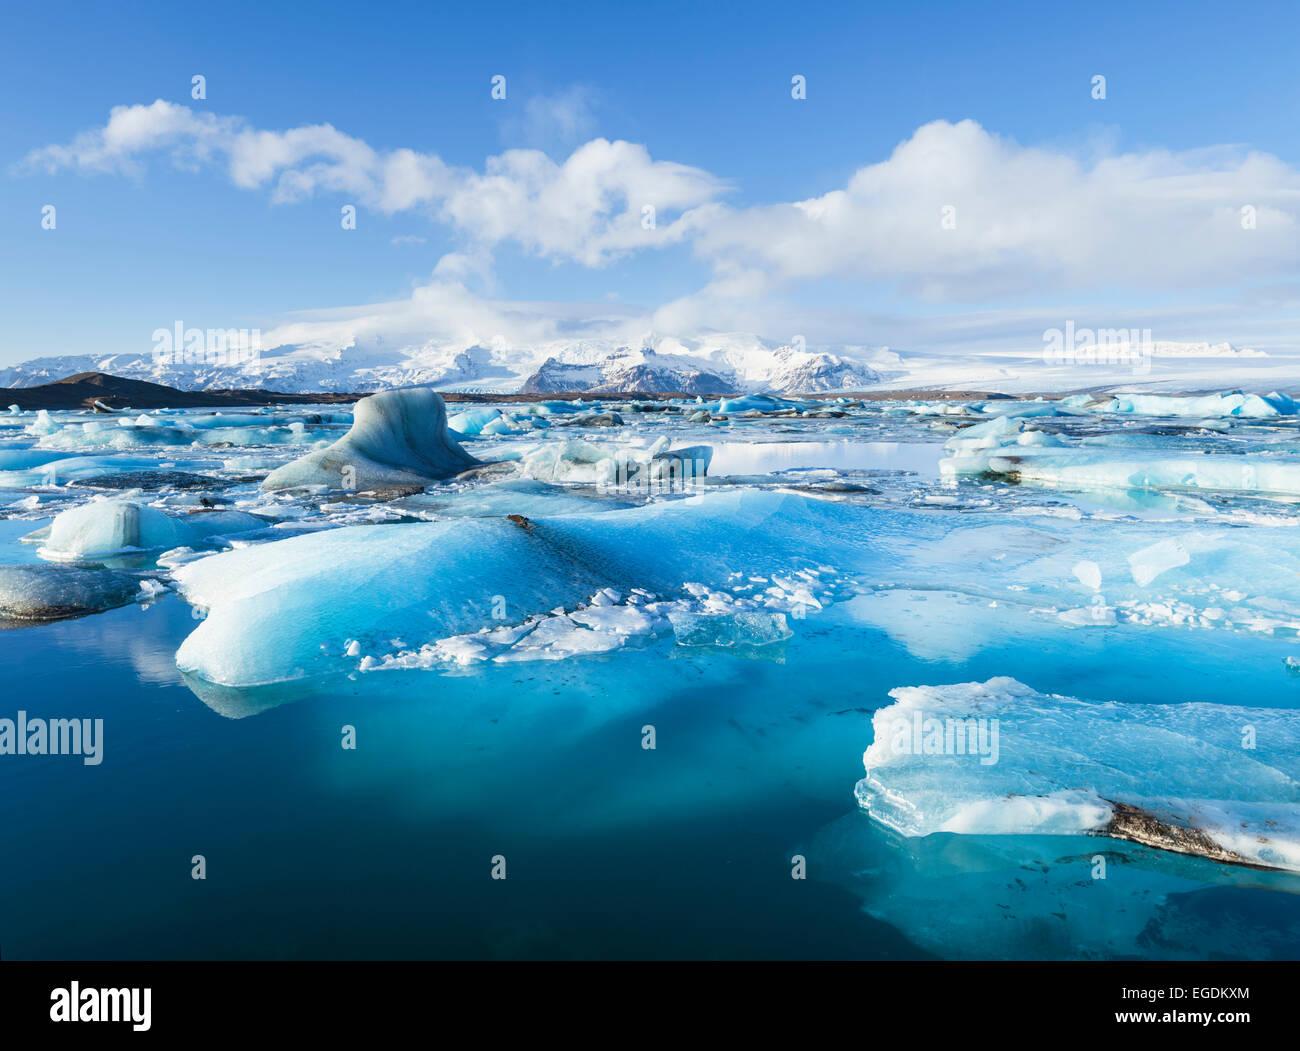 Jokulsarlon Iceberg Lagoon Panorama Jokulsarlon Iceland Europe - Stock Image